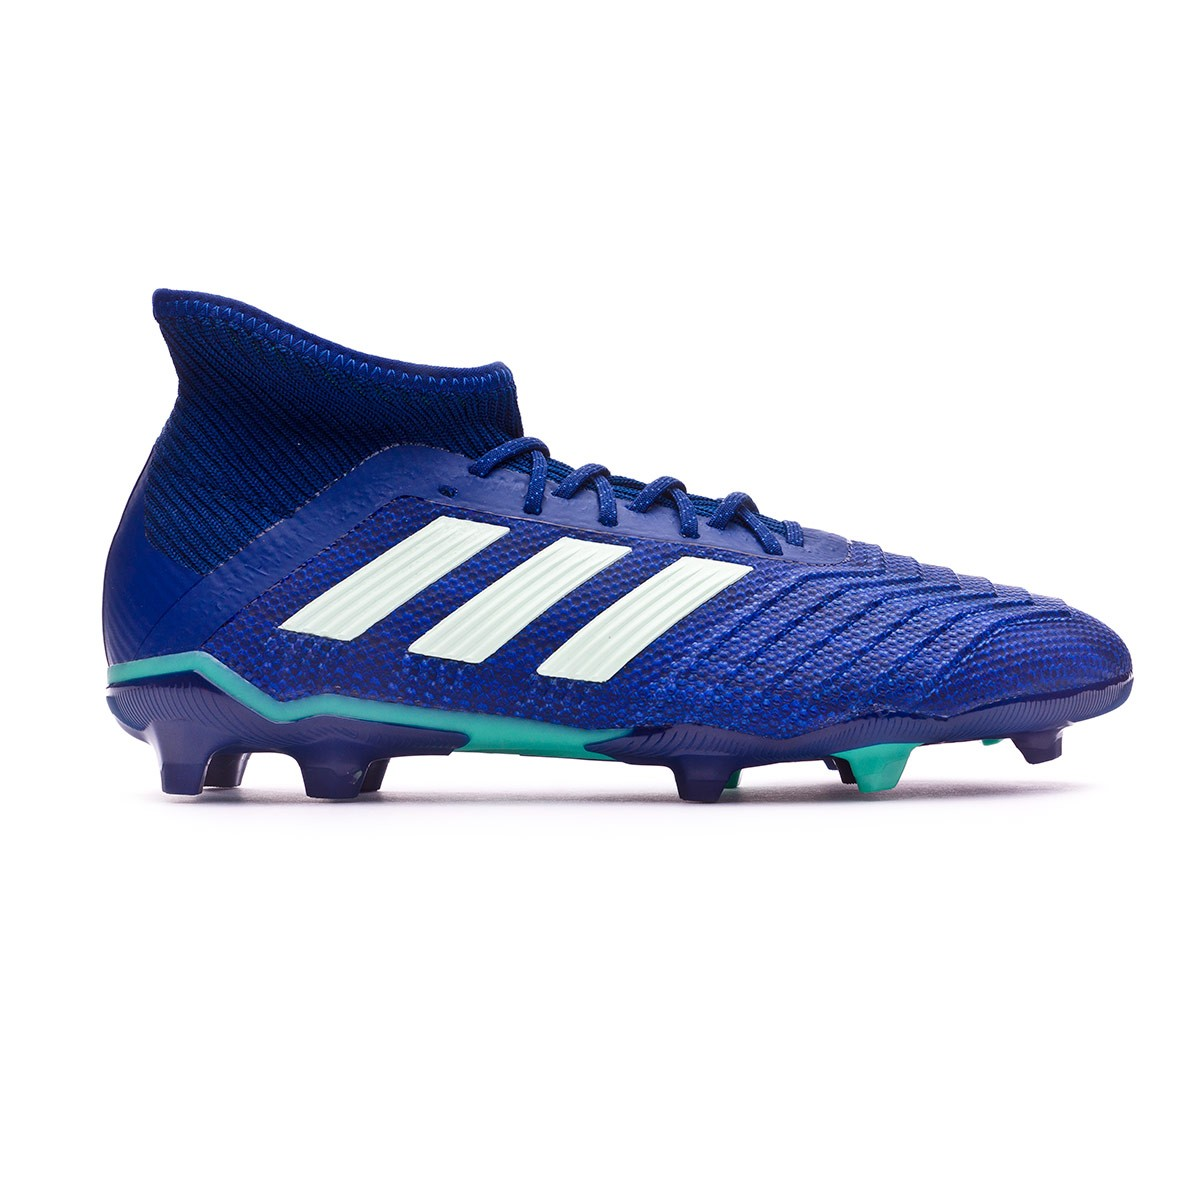 0aa49b240 Football Boots adidas Kids Predator 18.1 FG Unity ink-Aero green-Hi-res  green - Football store Fútbol Emotion